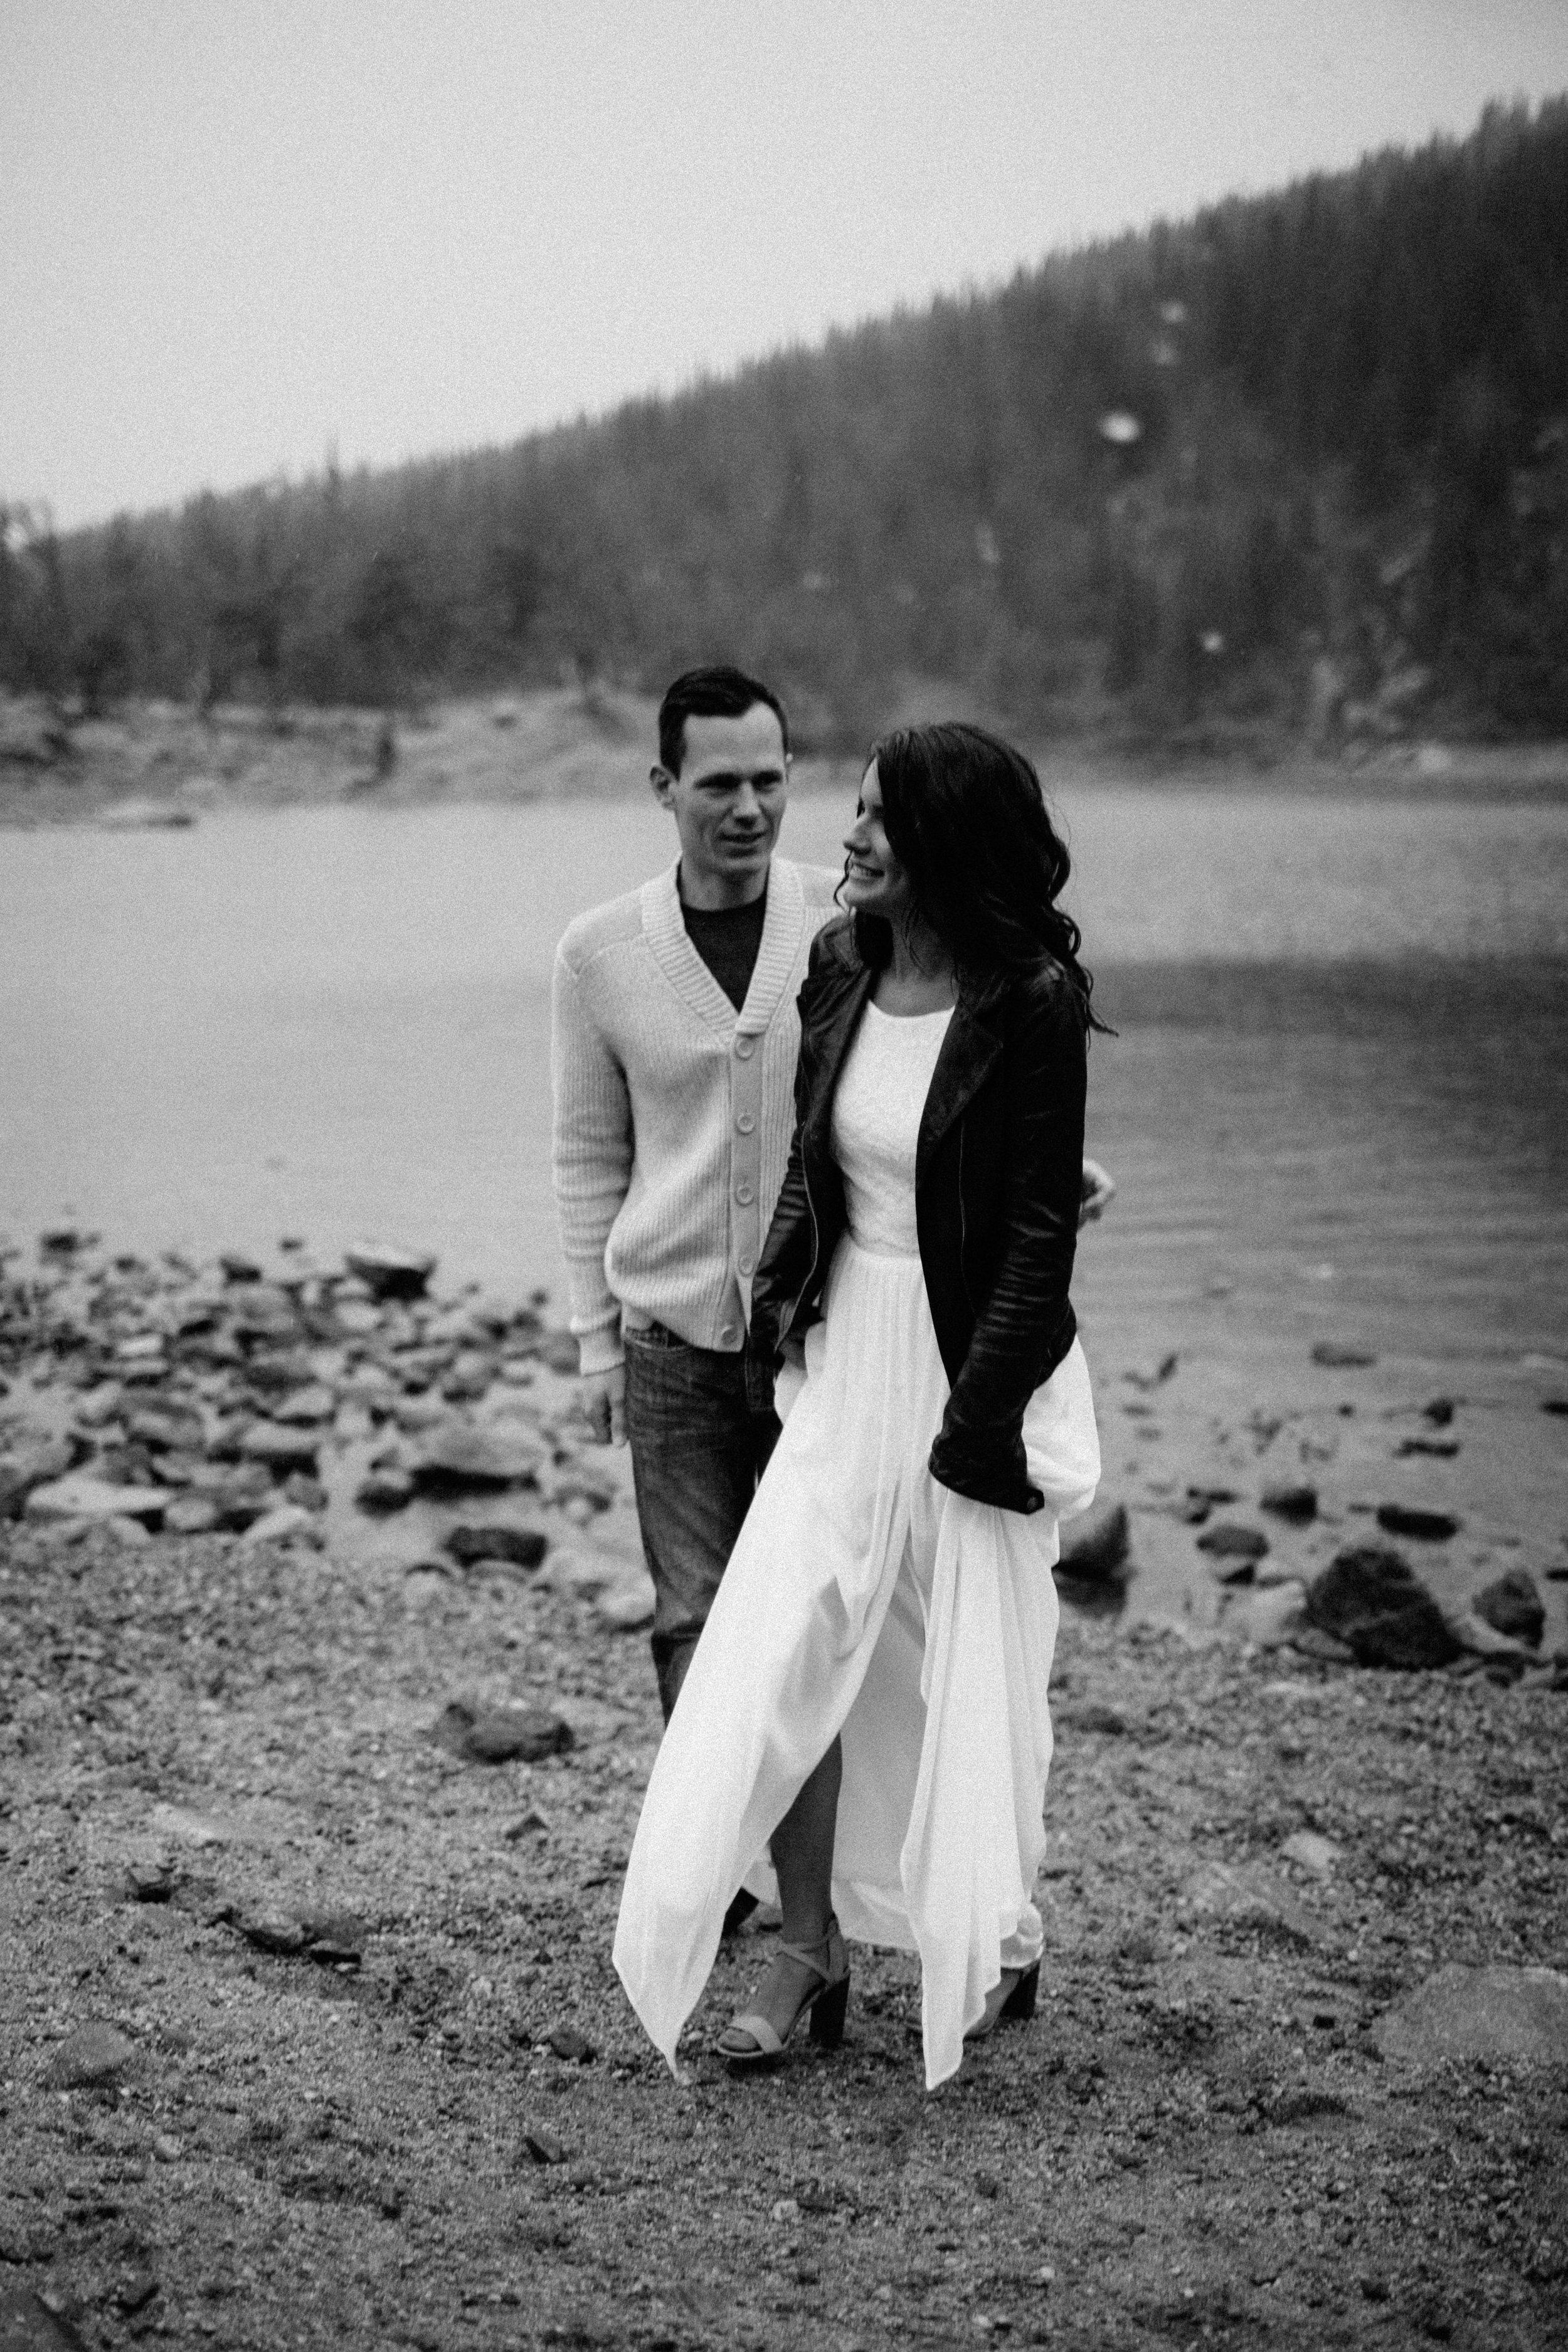 Saint Mary's Glacier Engagement Photography and Destination Wedding Photographers